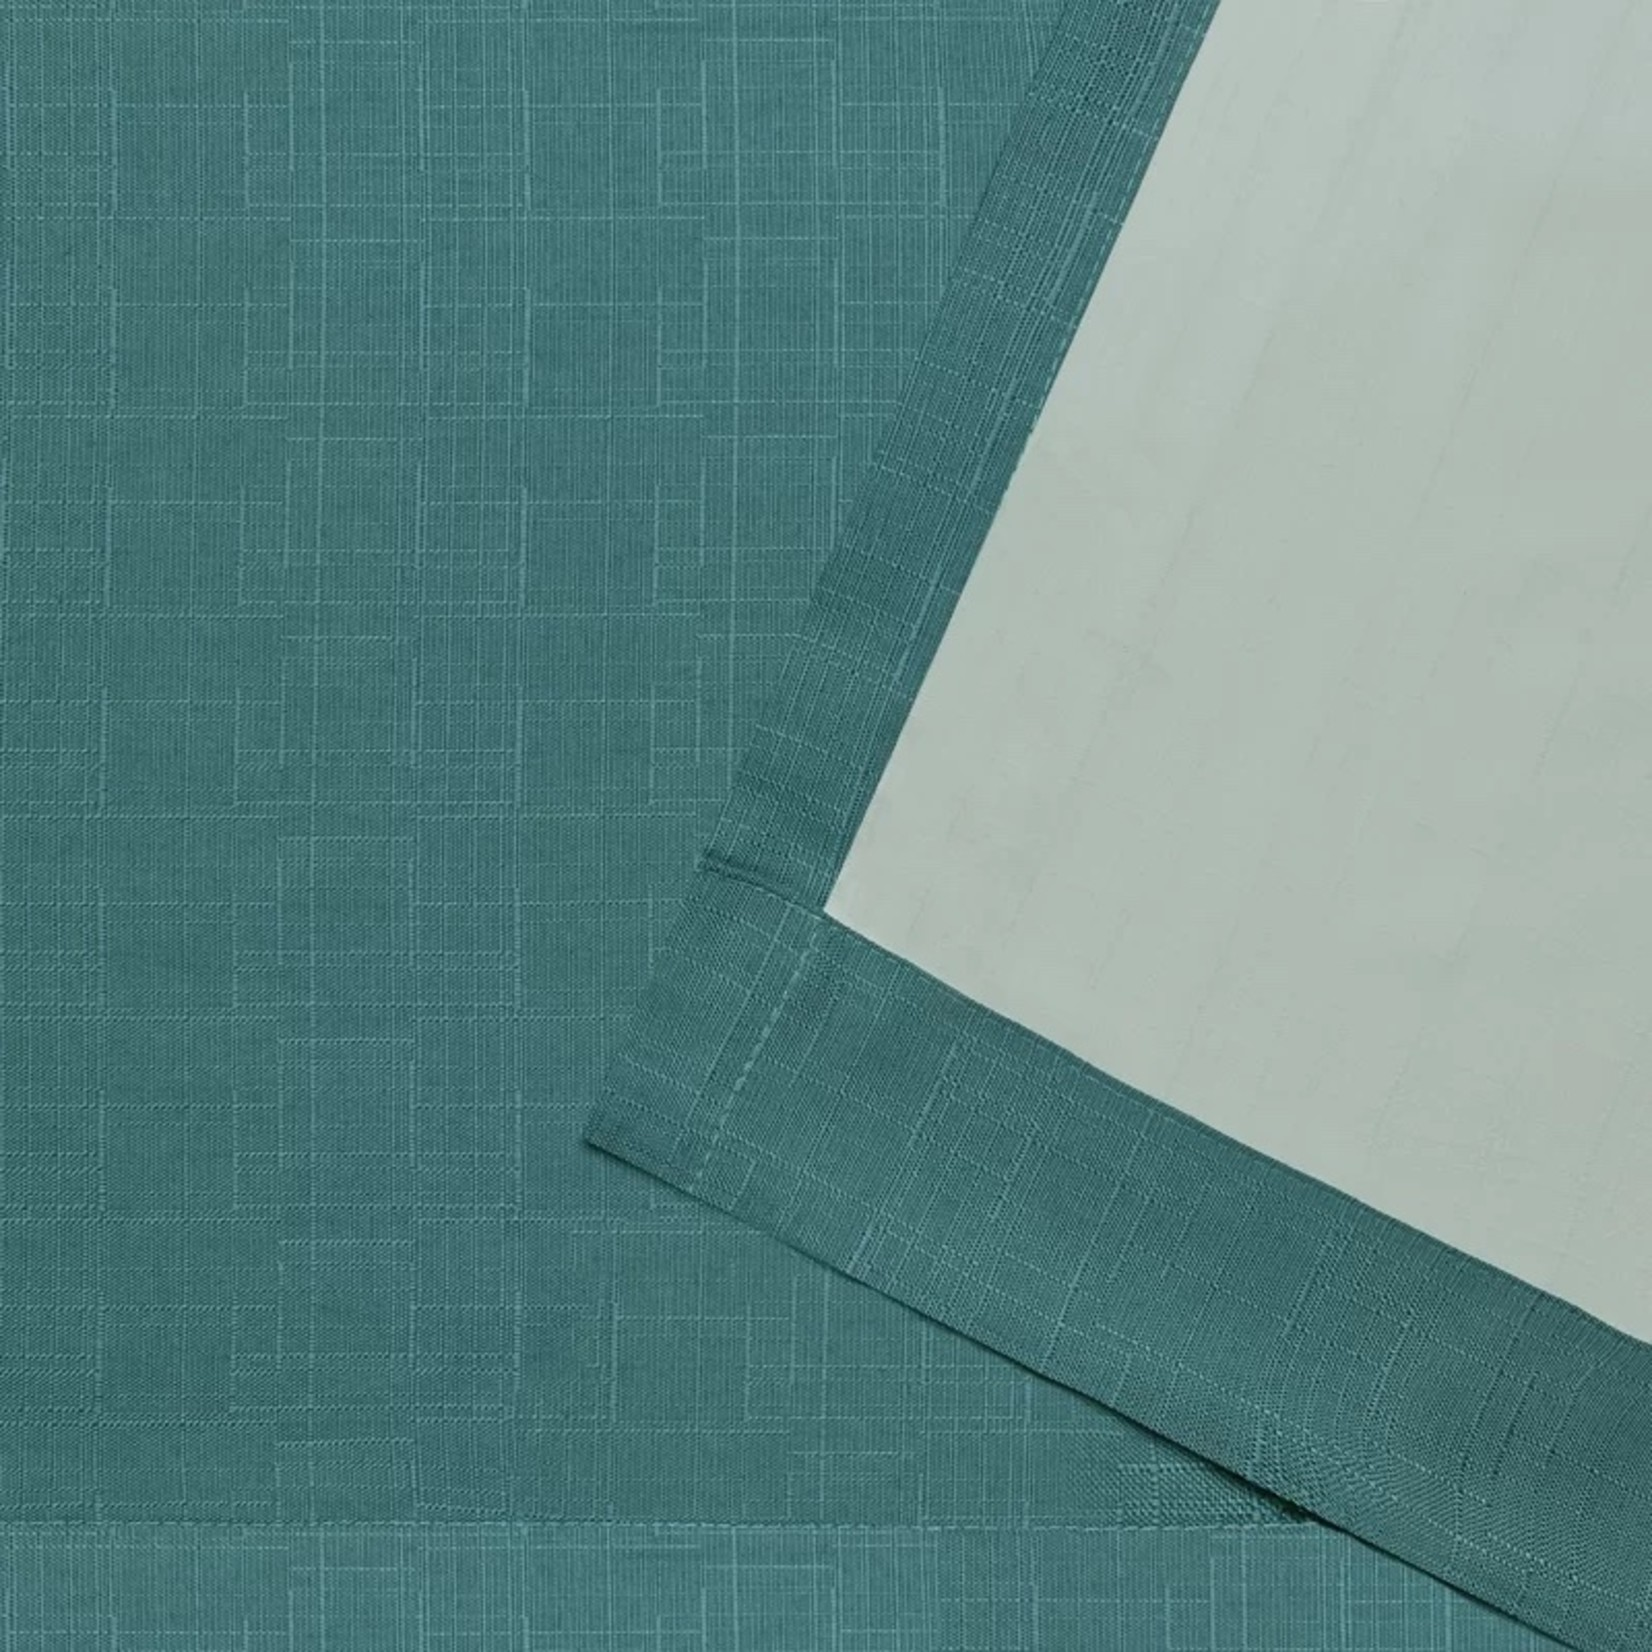 "*Aaliyah Solid Color Semi-Sheer Grommet Curtain Panels - 54"" x 84"" - Set of 2 - Final Sale"